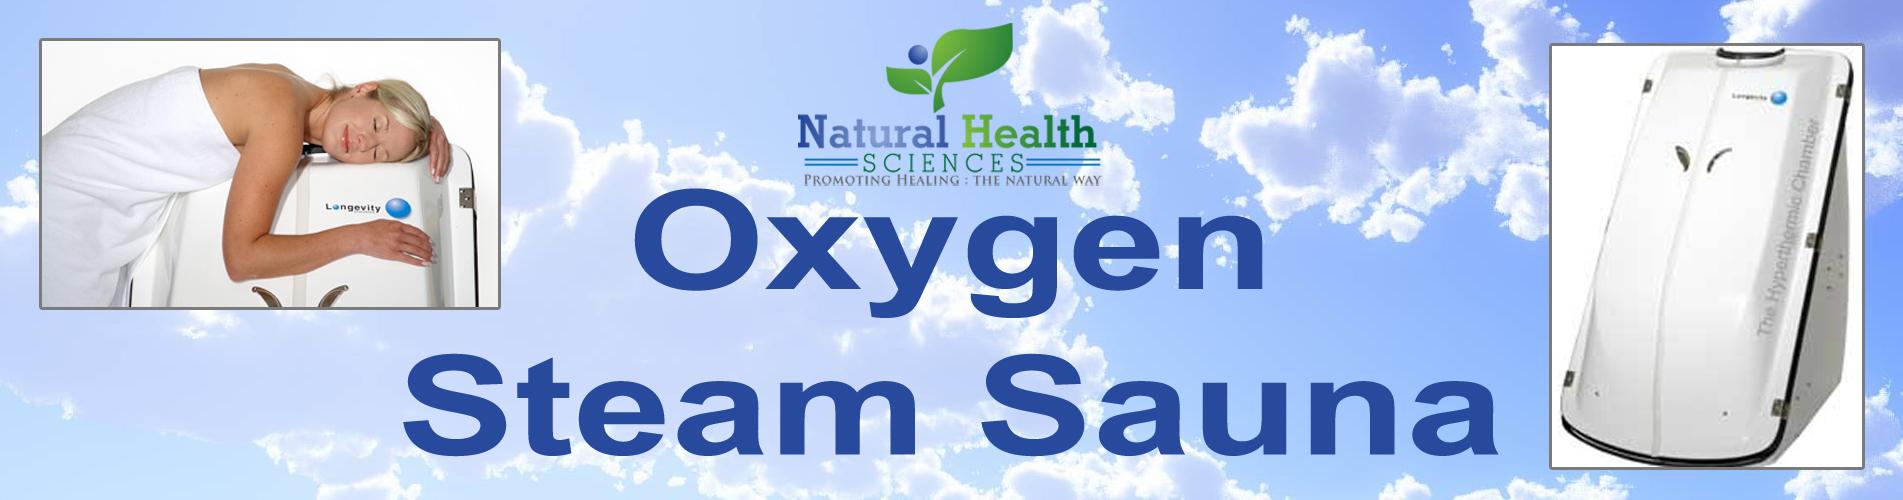 natural-health-sciences-arizona-oxygen-steam-sauna